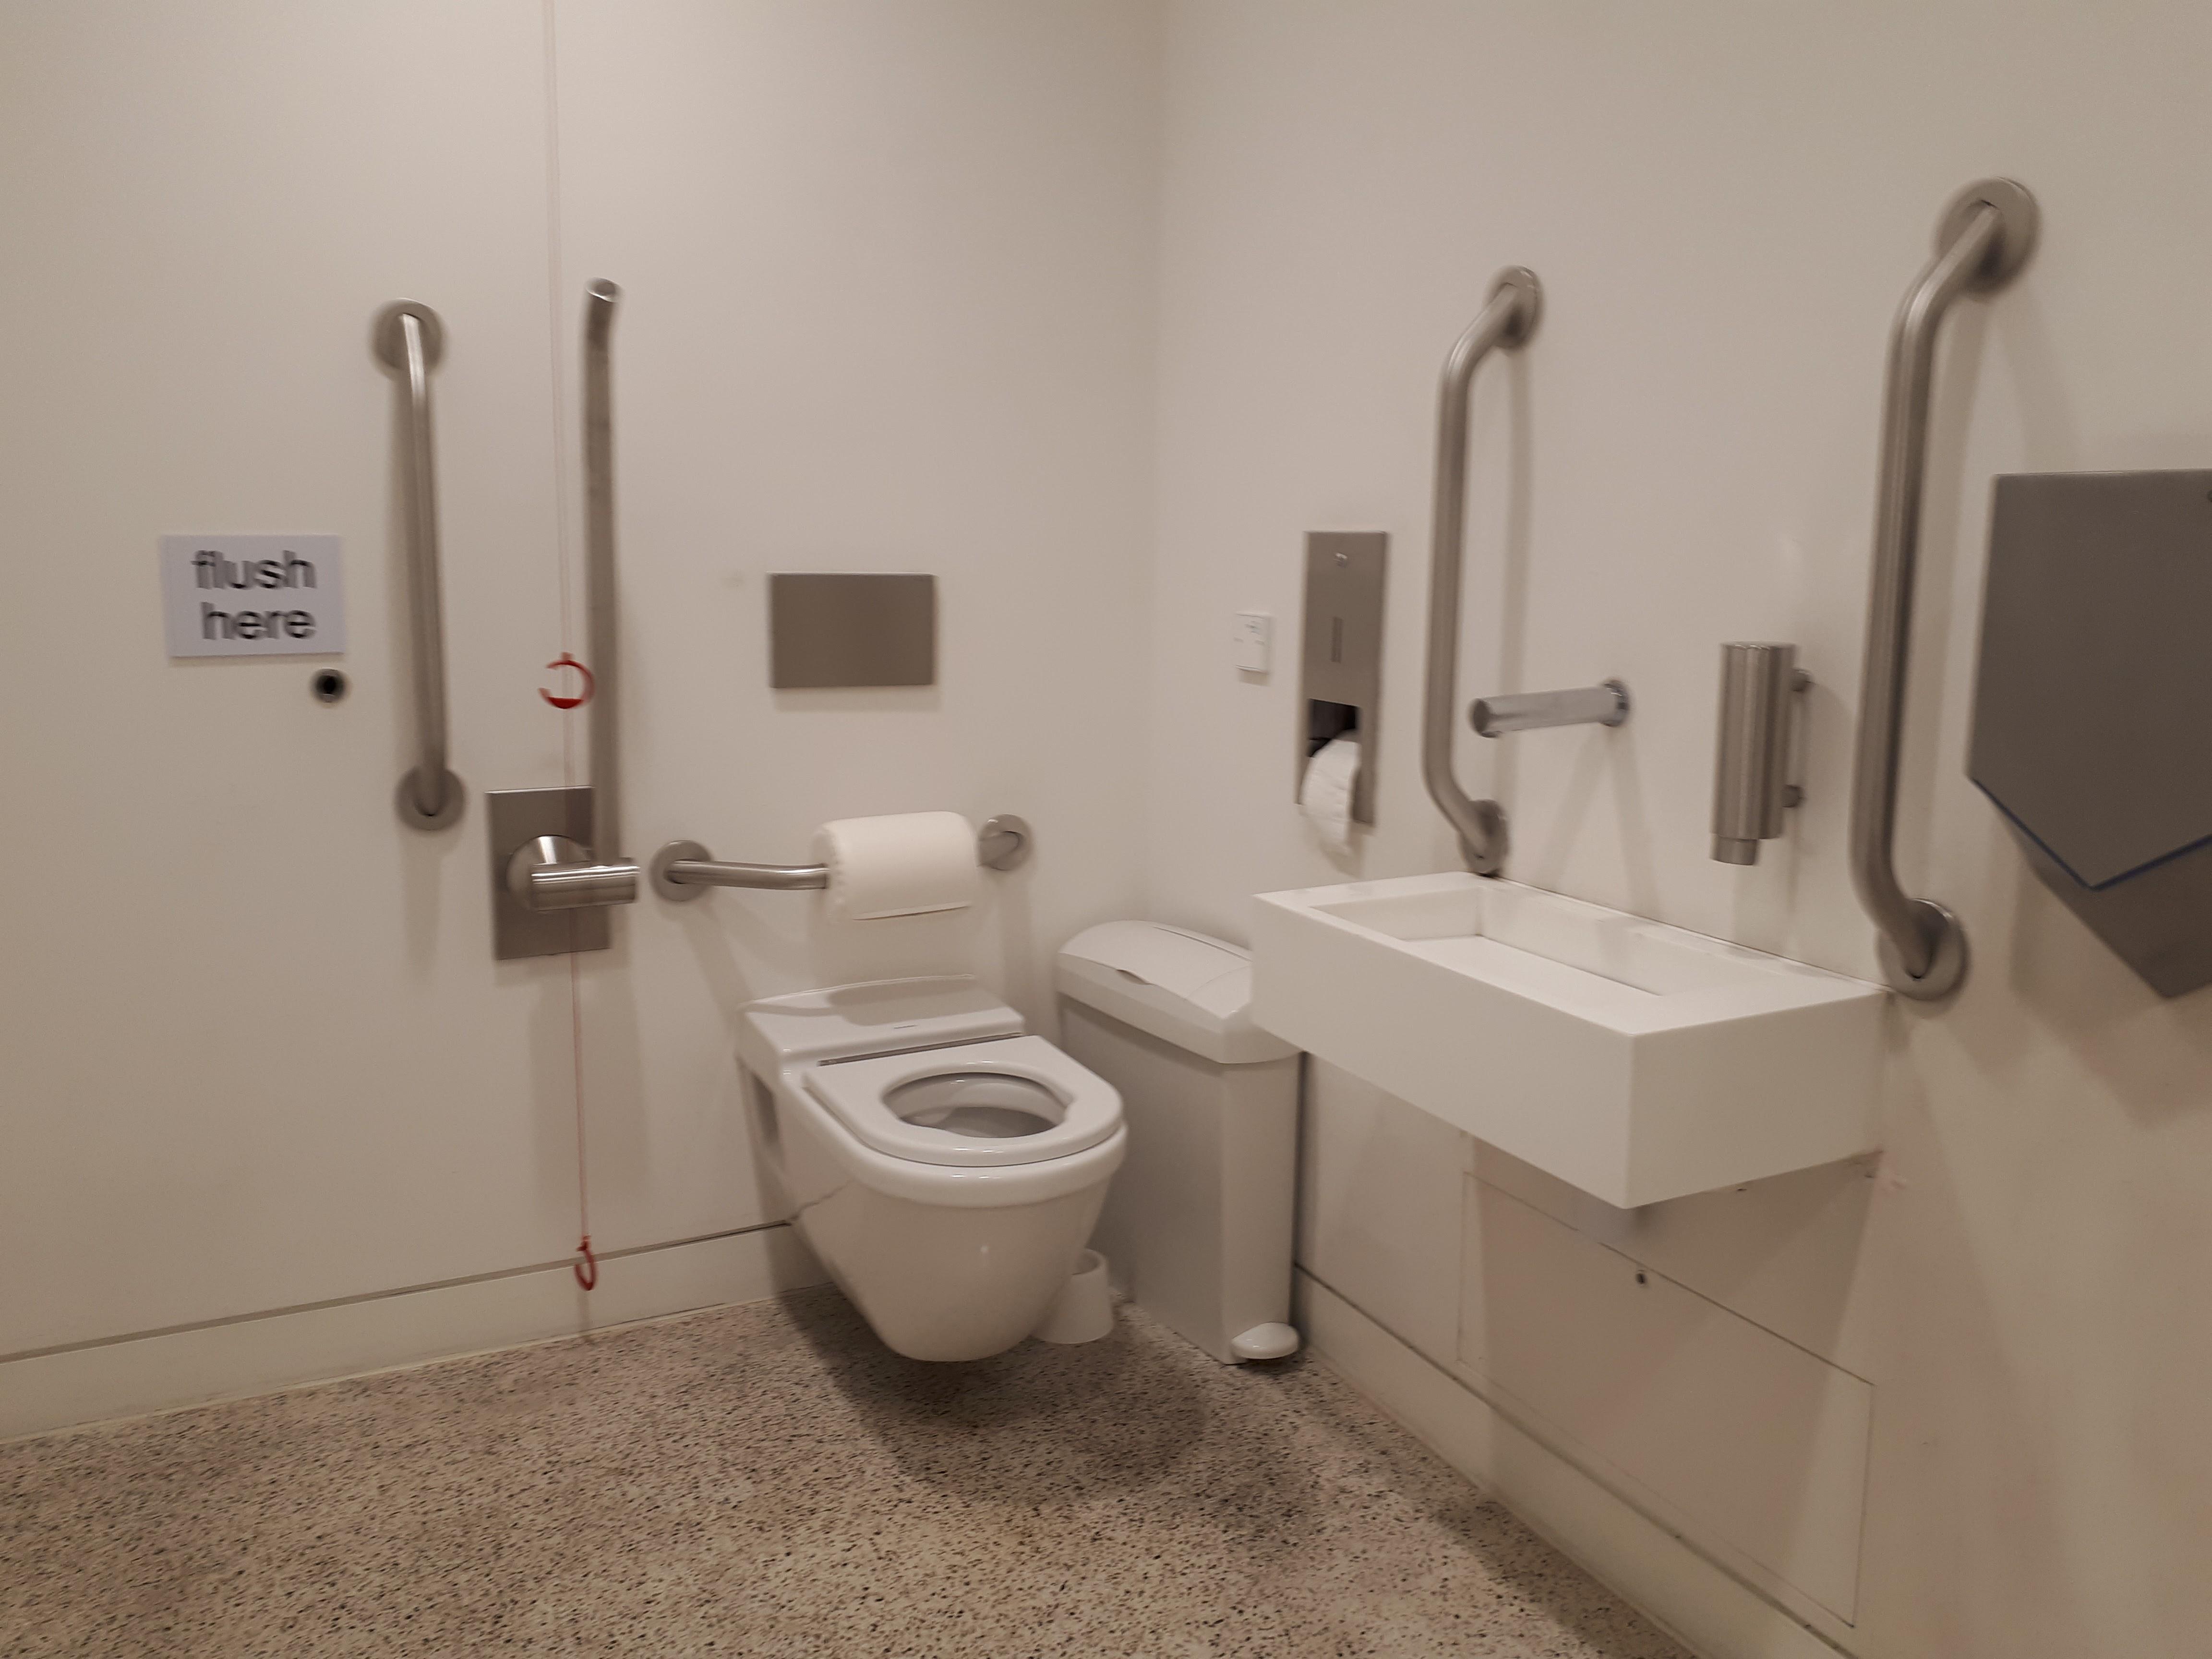 Cool Mobility Grab Rails Photos - Bathtub for Bathroom Ideas ...